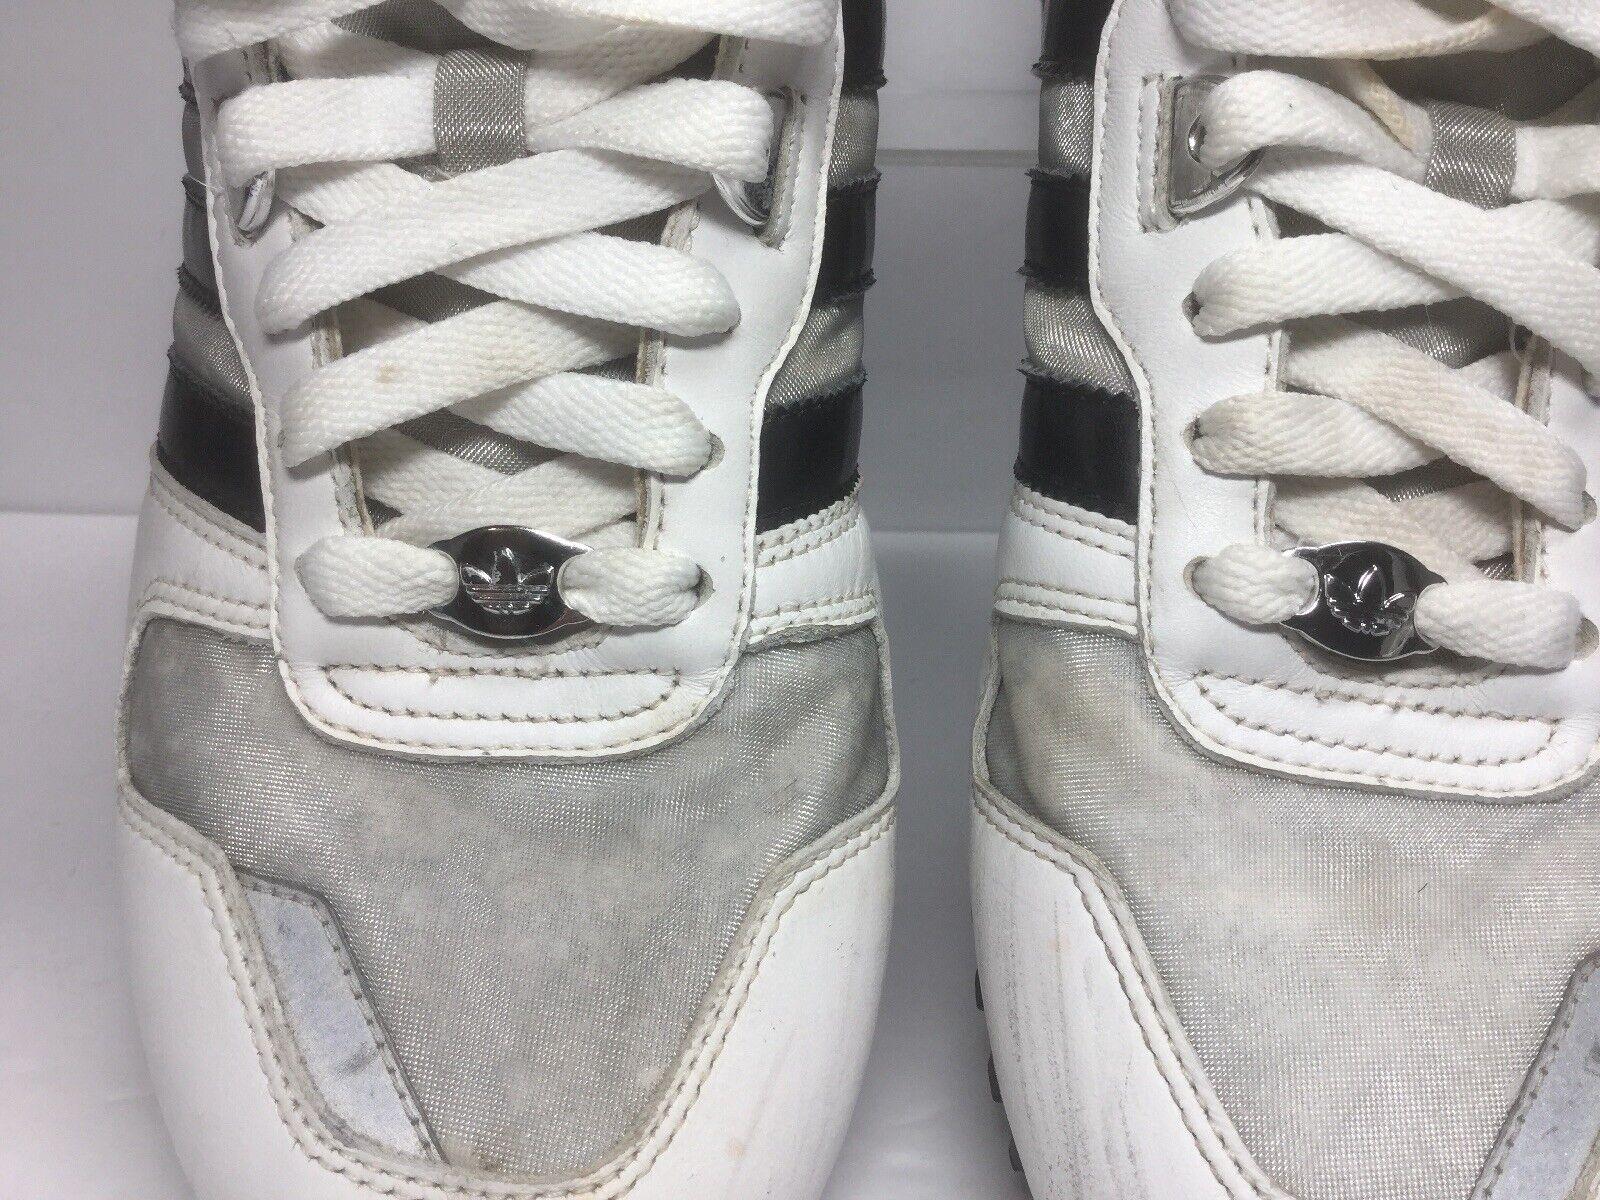 Adidas Mens ZX 700 3Streifen Leather running shoes White size 7.5 M